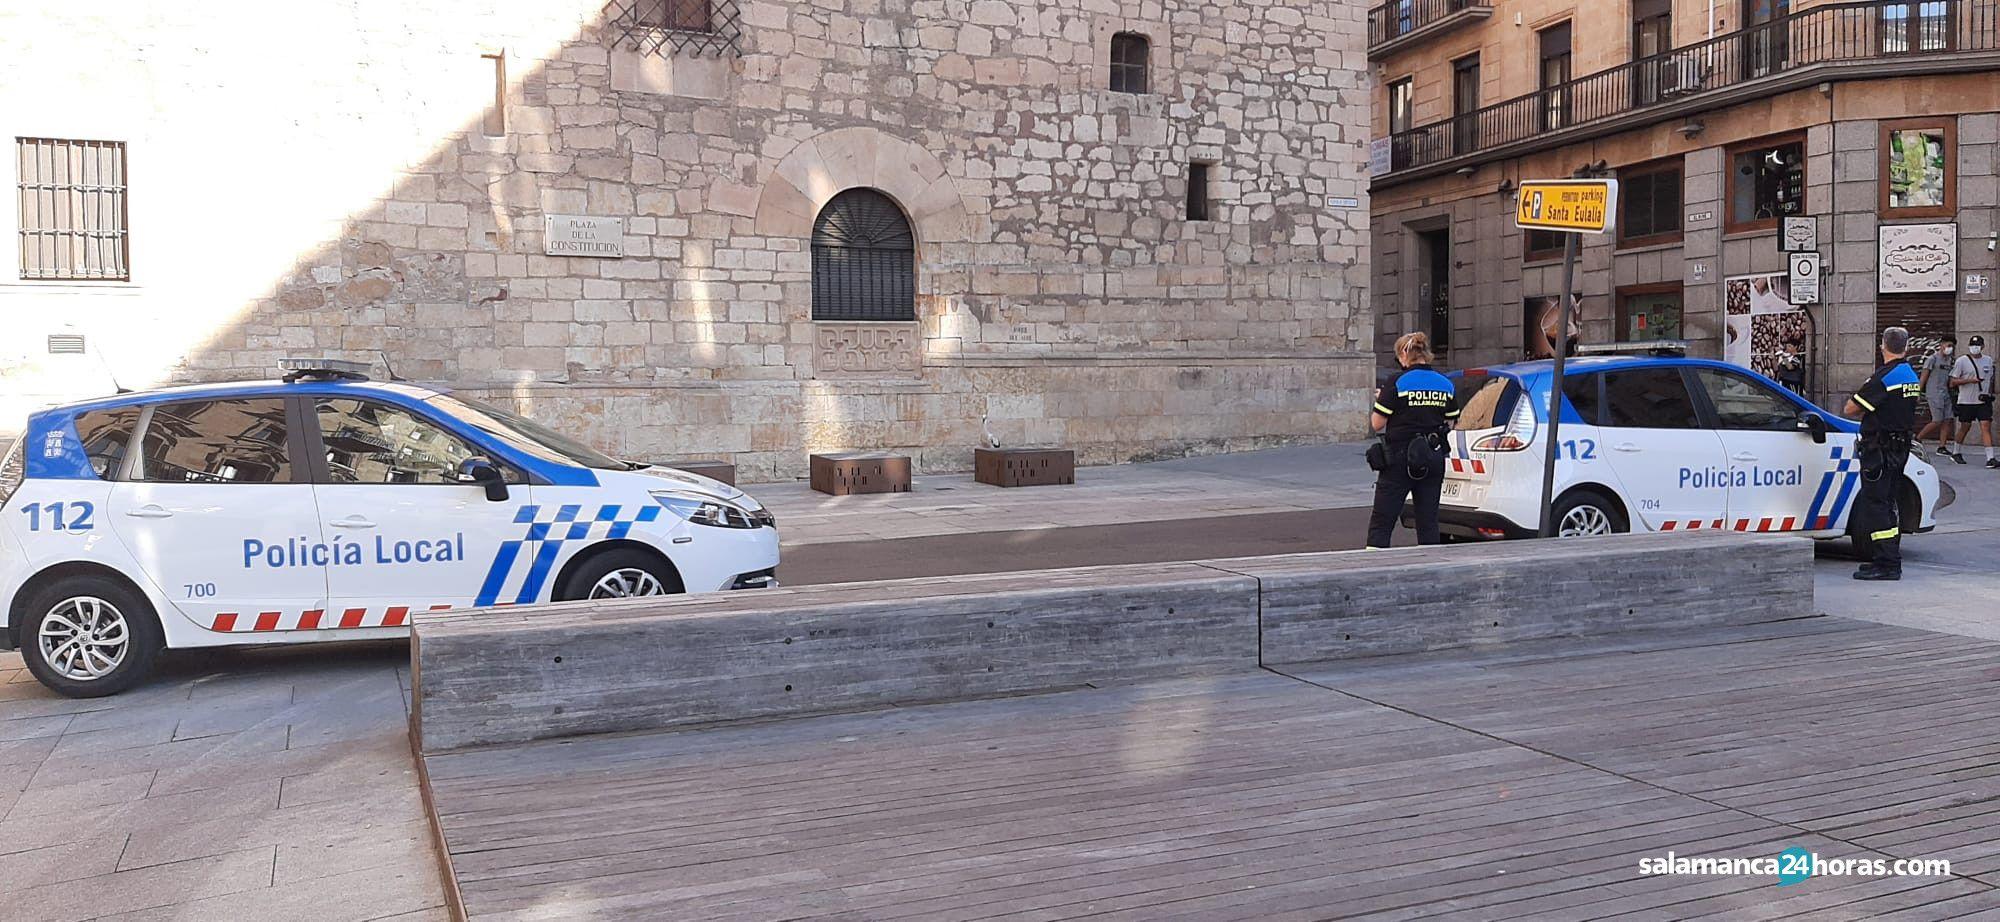 Policía Local Cigueña (6)